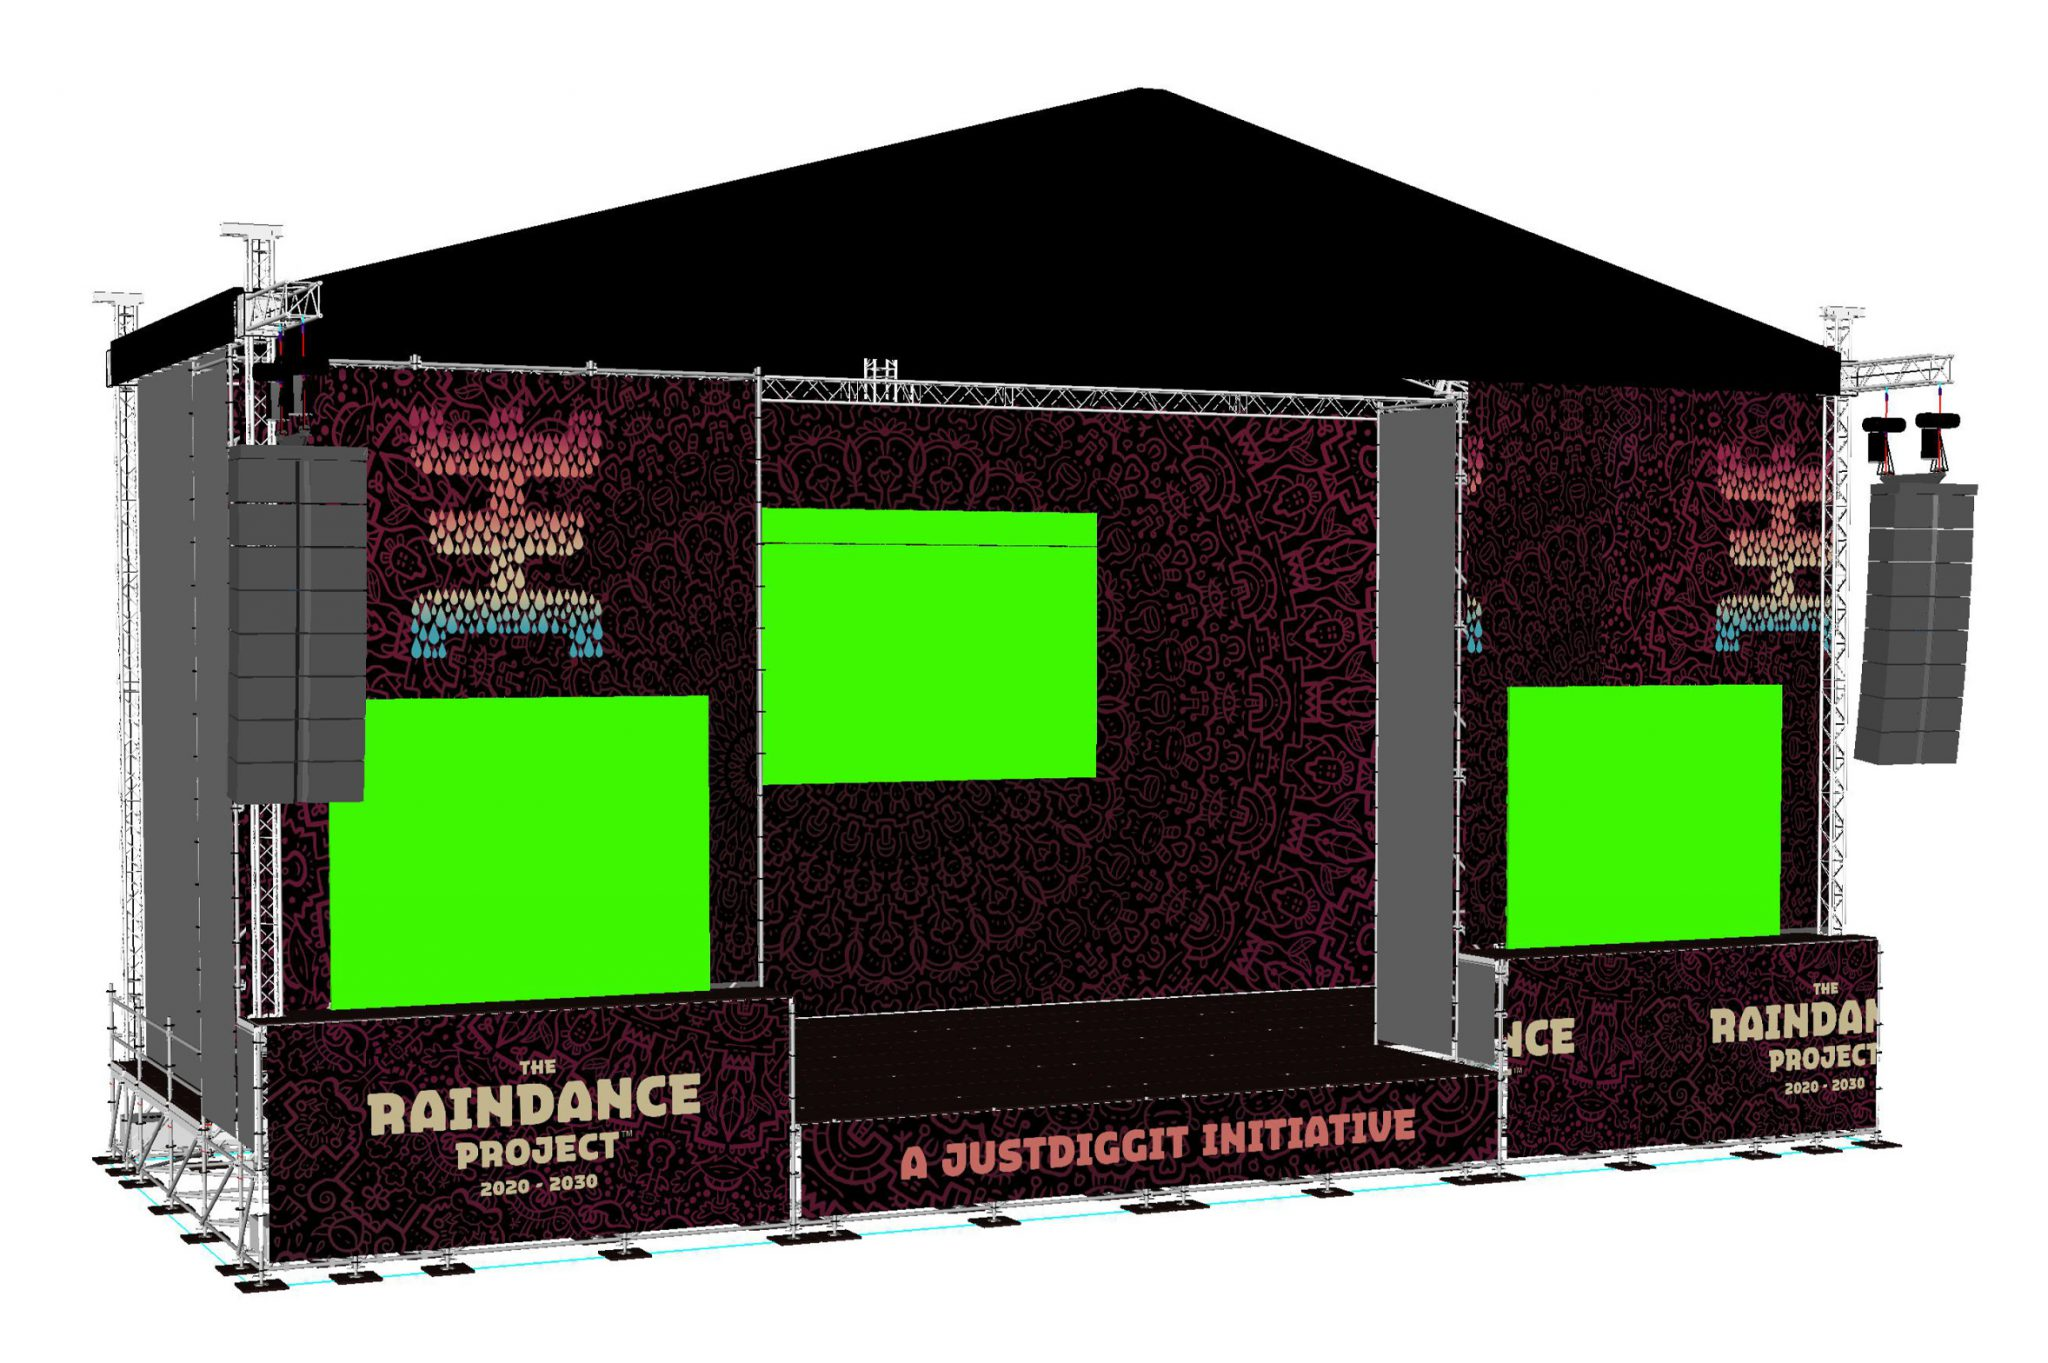 The Raindance Project